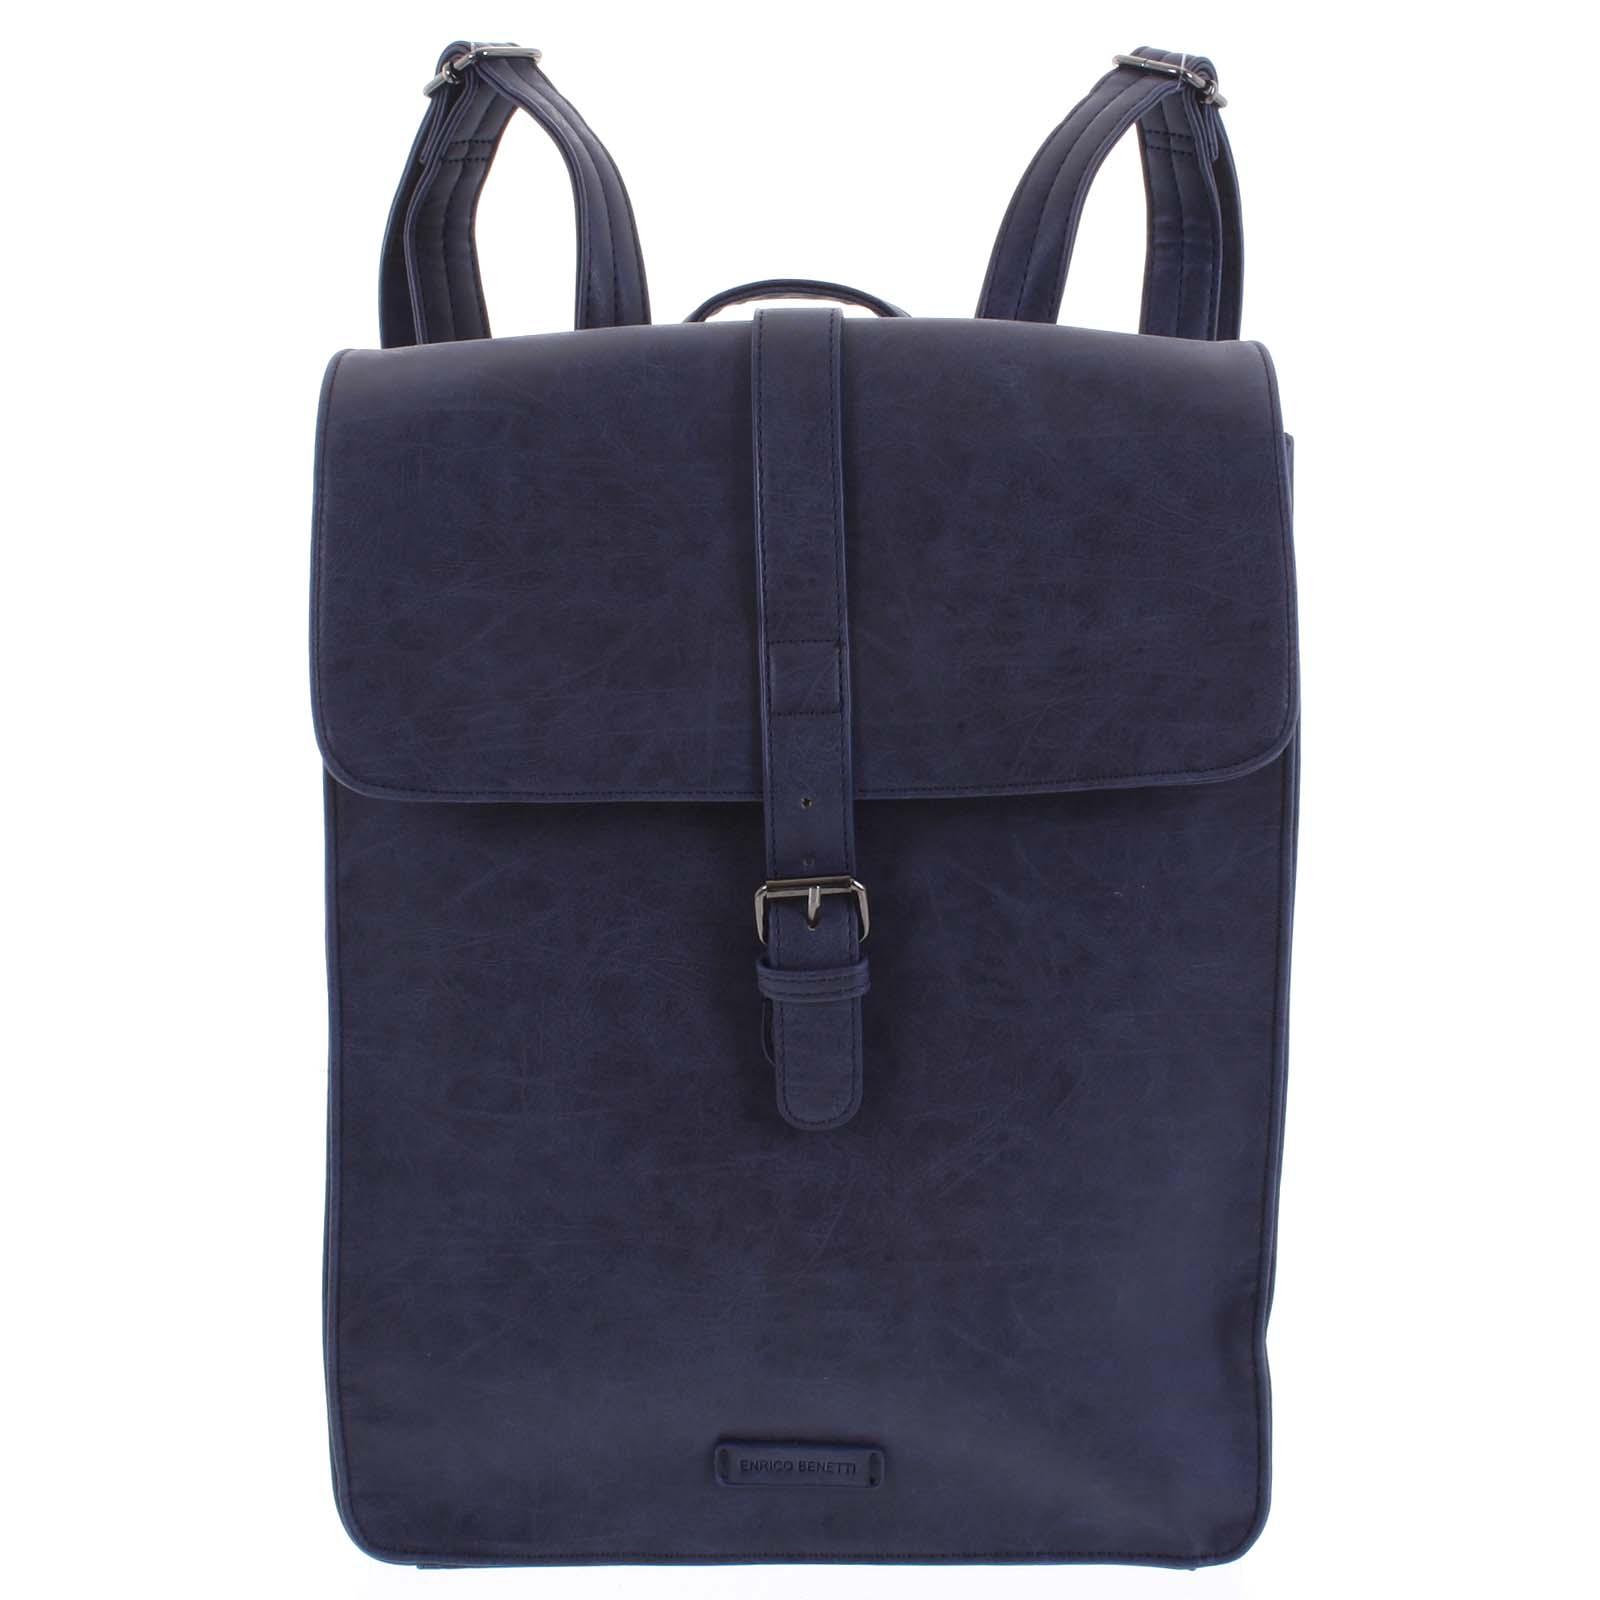 Stylový batoh tmavě modrý - Enrico Benetti Darlo